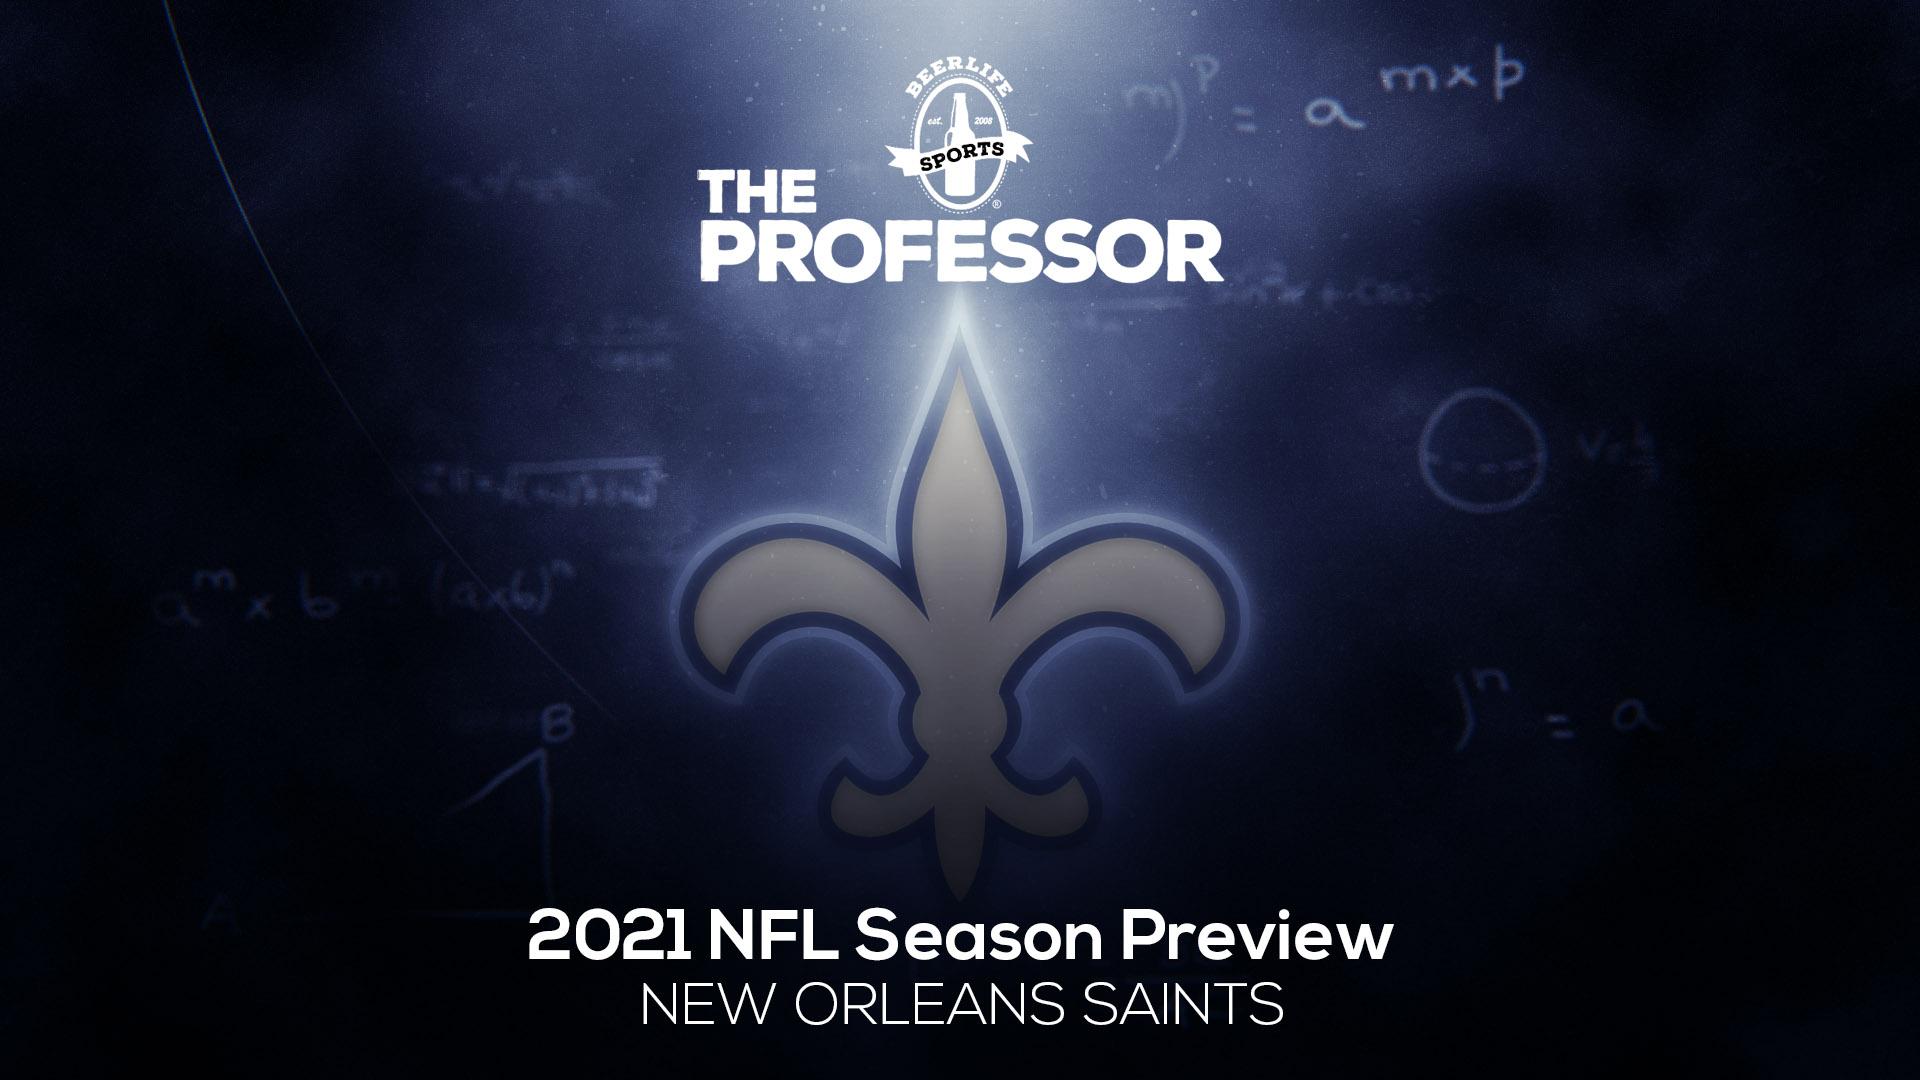 TheProfessor_NFL preview-Saints